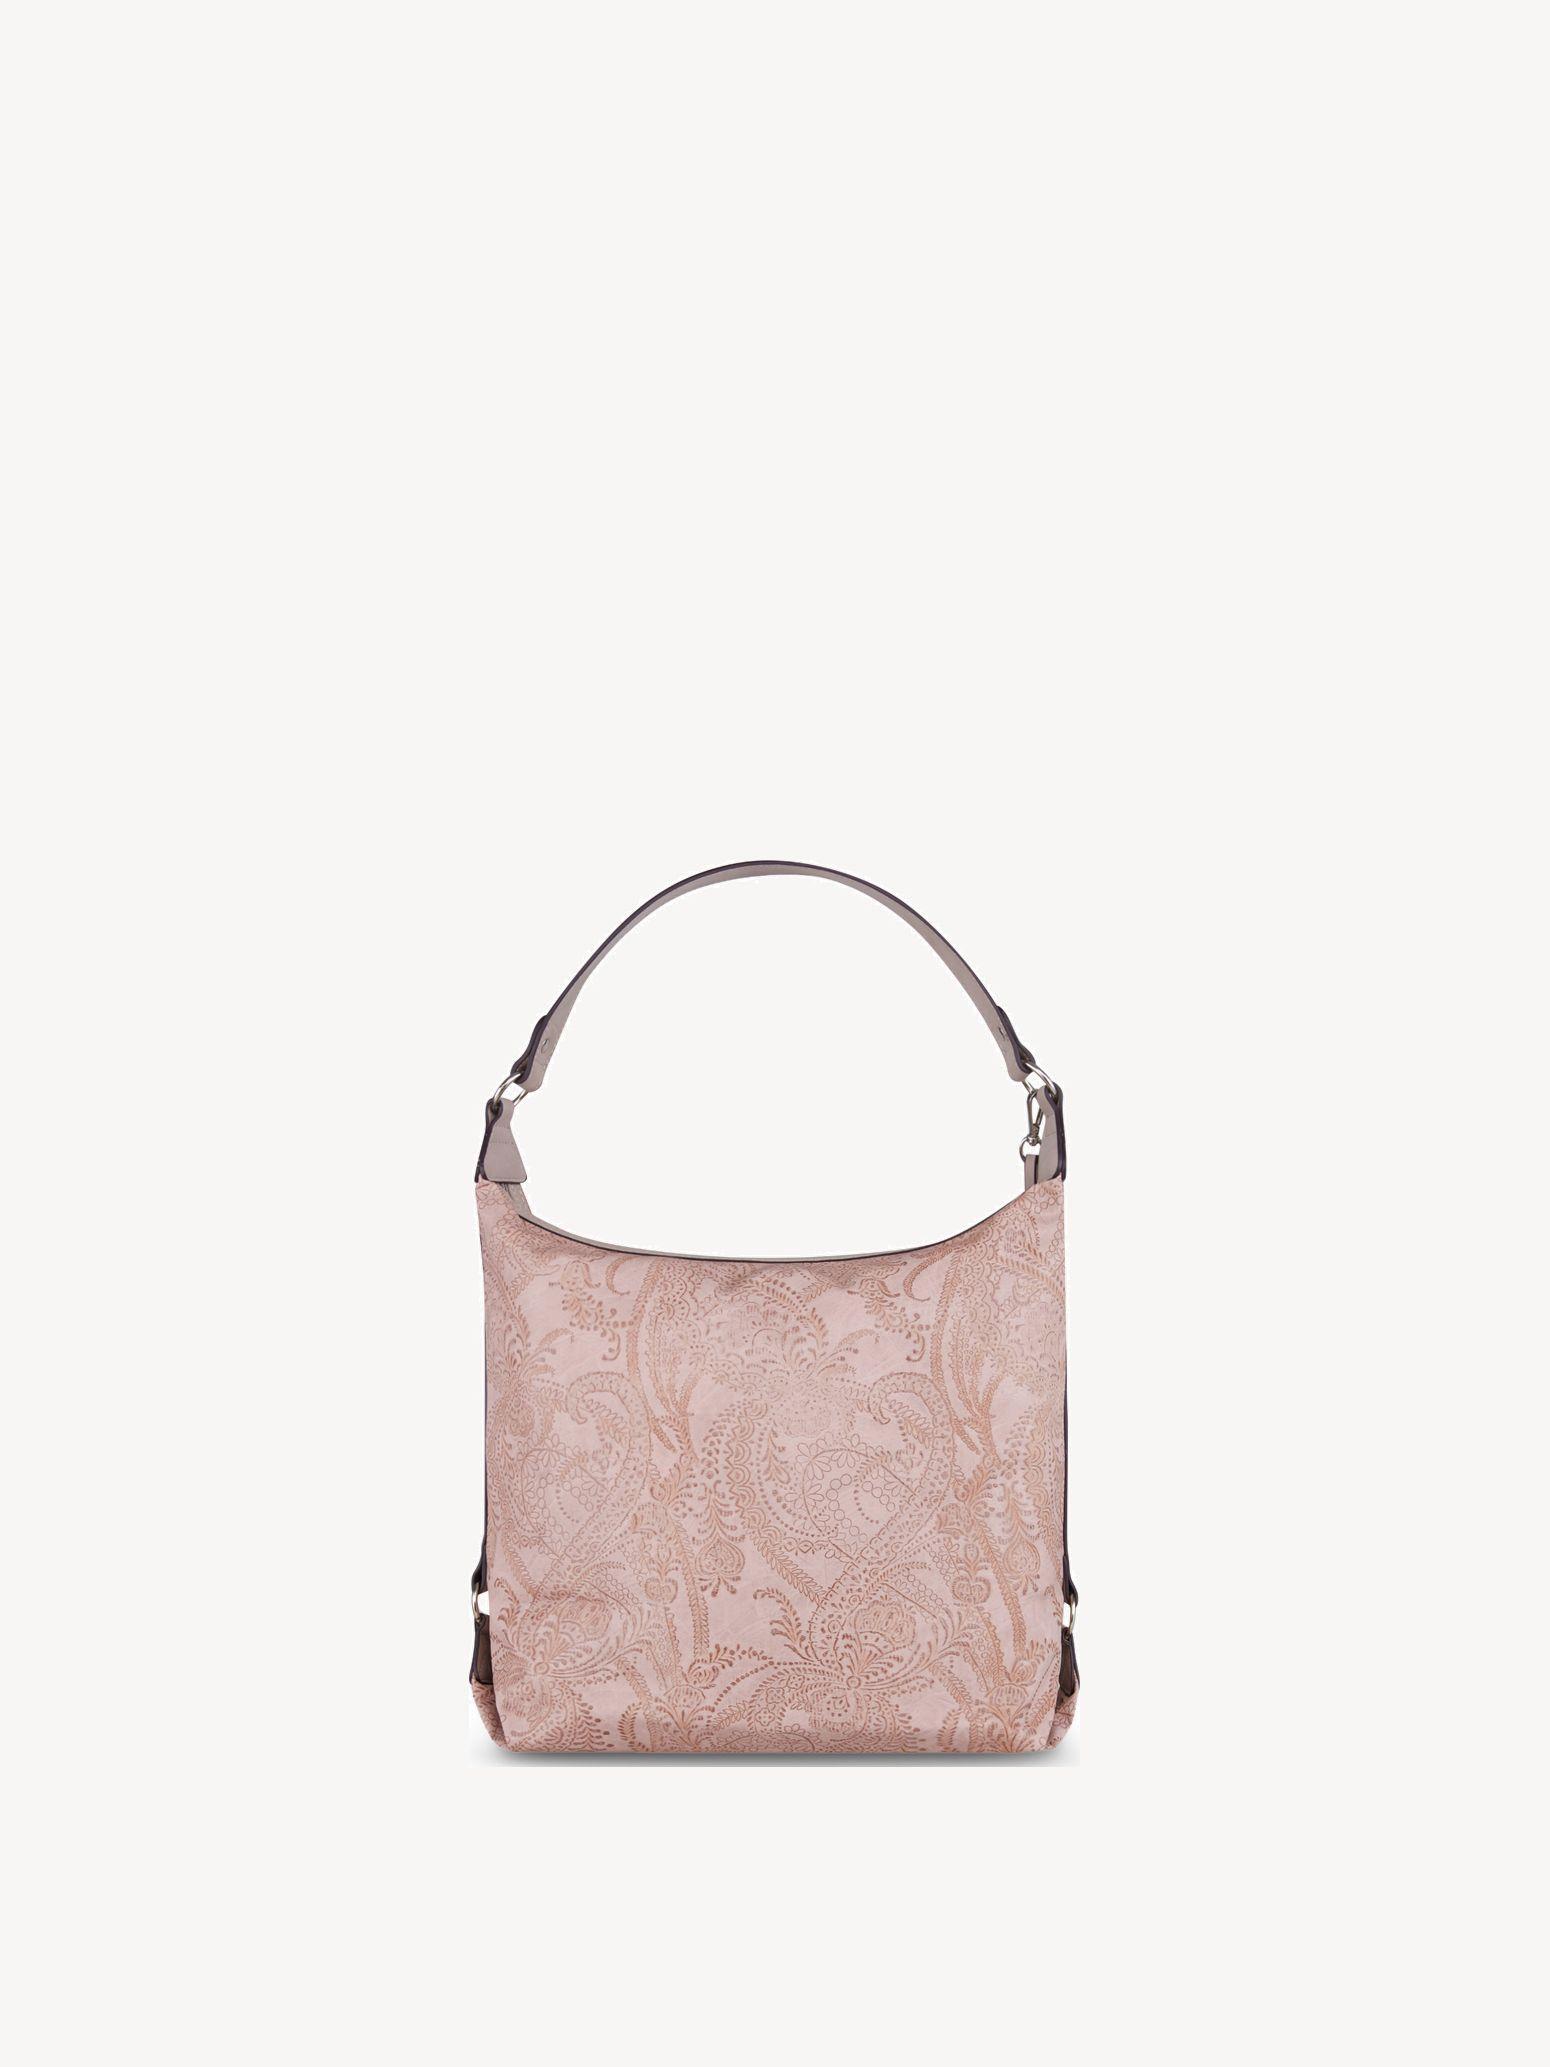 4a3b64ff35f Matilda 2955182: Buy Tamaris Handbags online!